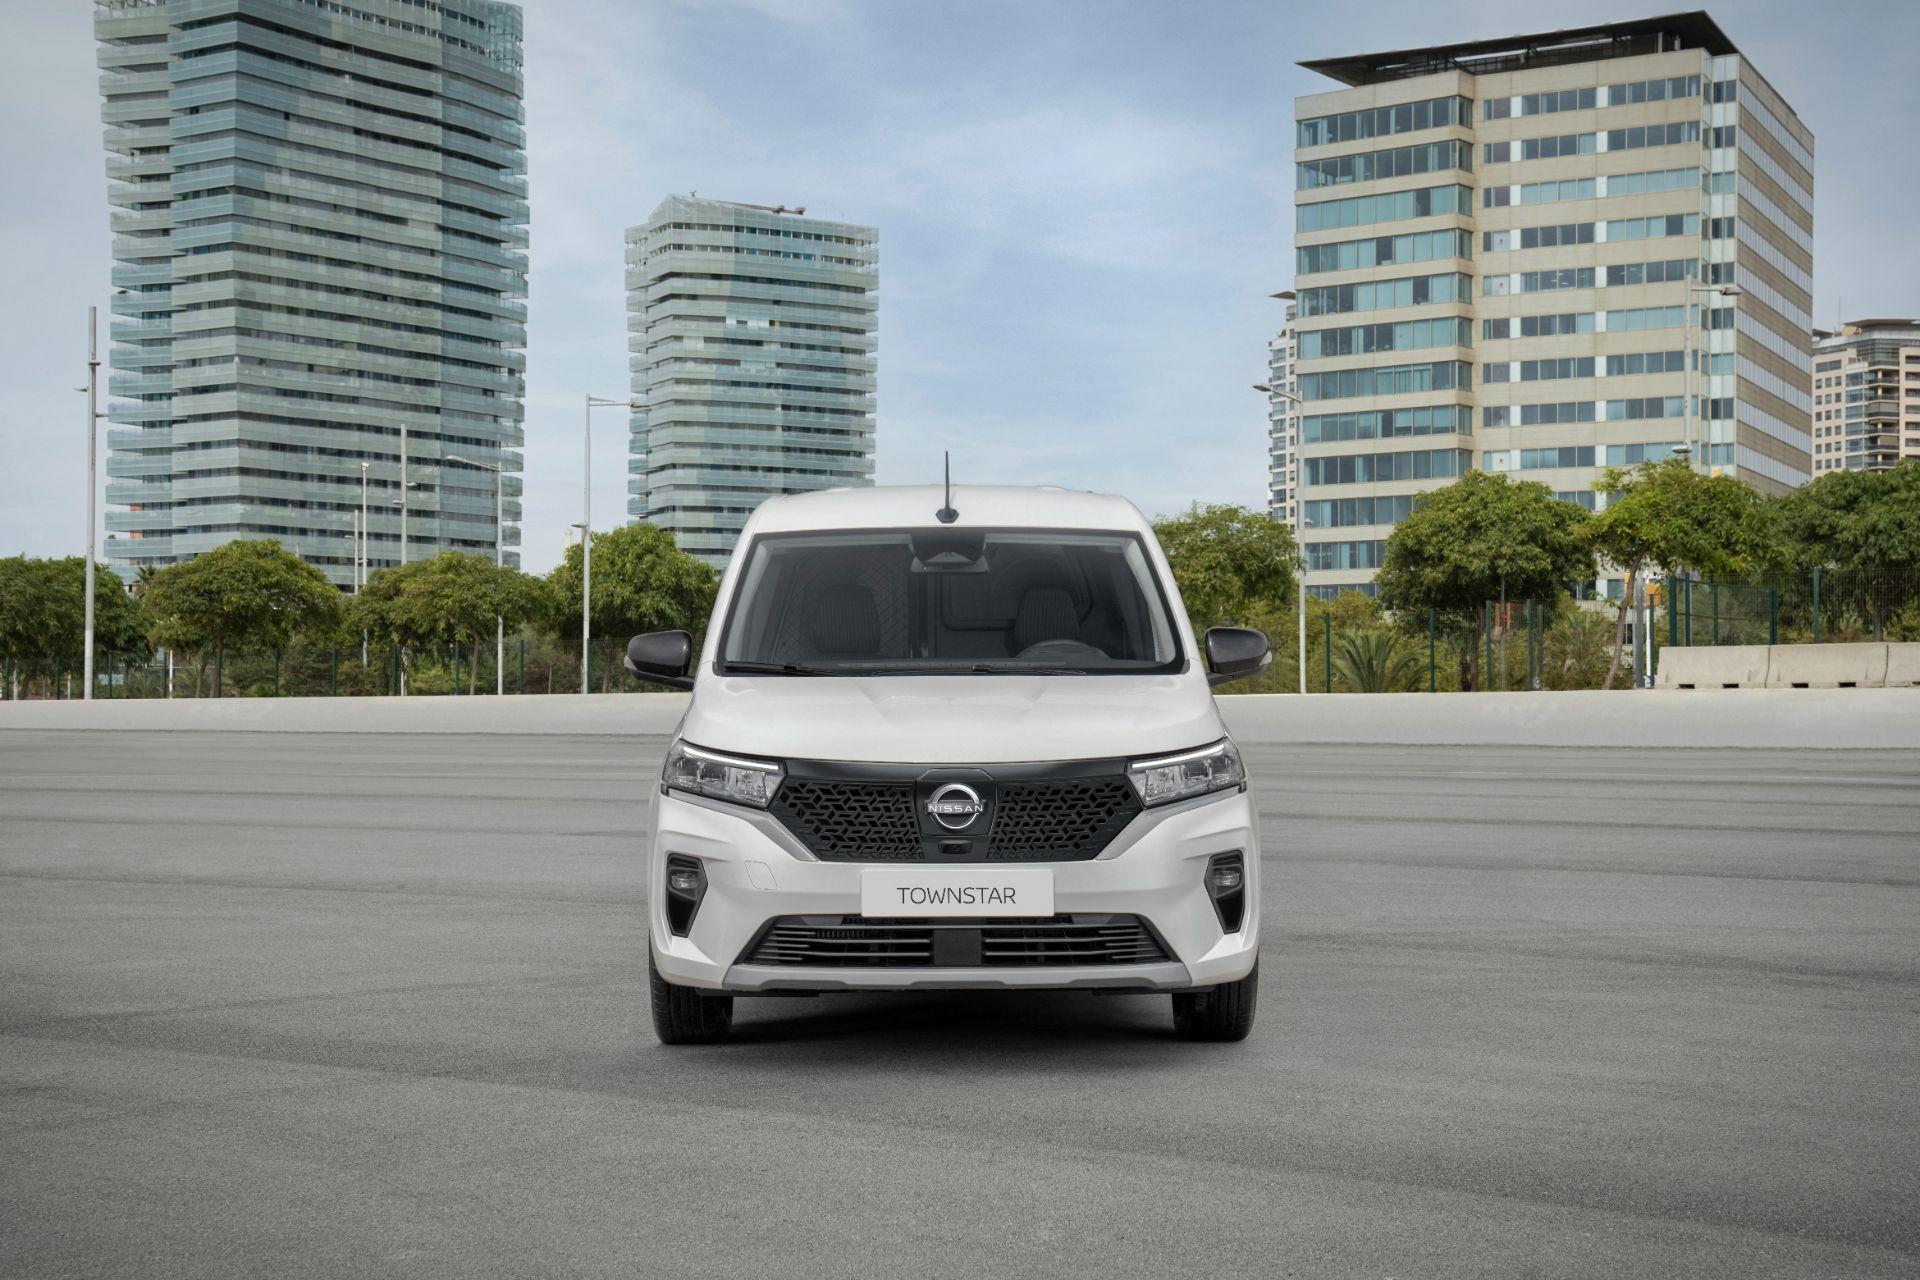 2022-Nissan-Townstar-EV-van-dynamic-7